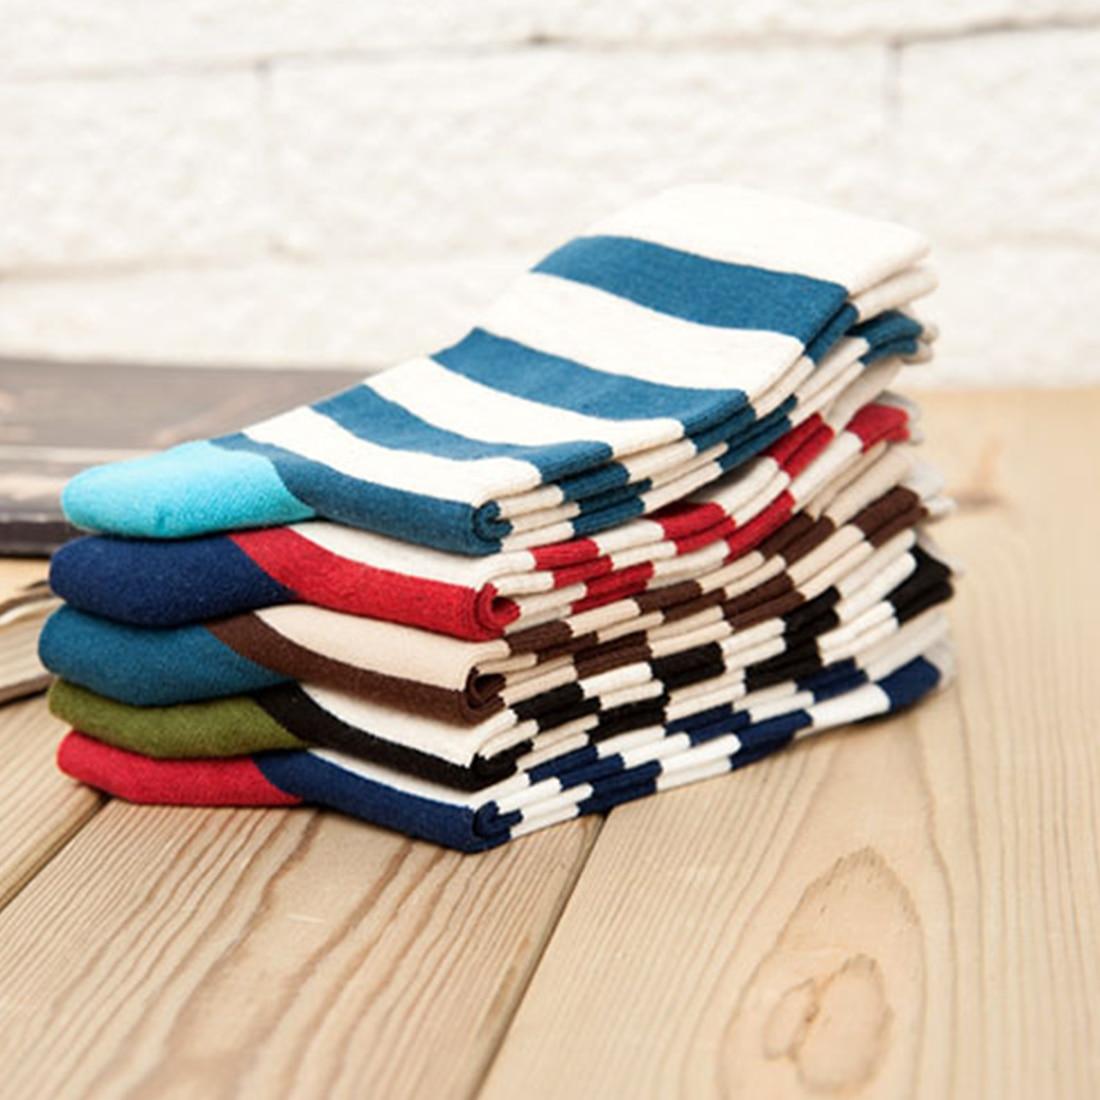 Top Sale 1Pair Colour Stripes Men Crew   Socks   of Happy   Sock   Casual Harajuku Long   Socks   Fashion Funky Design Crews Men Women   Socks